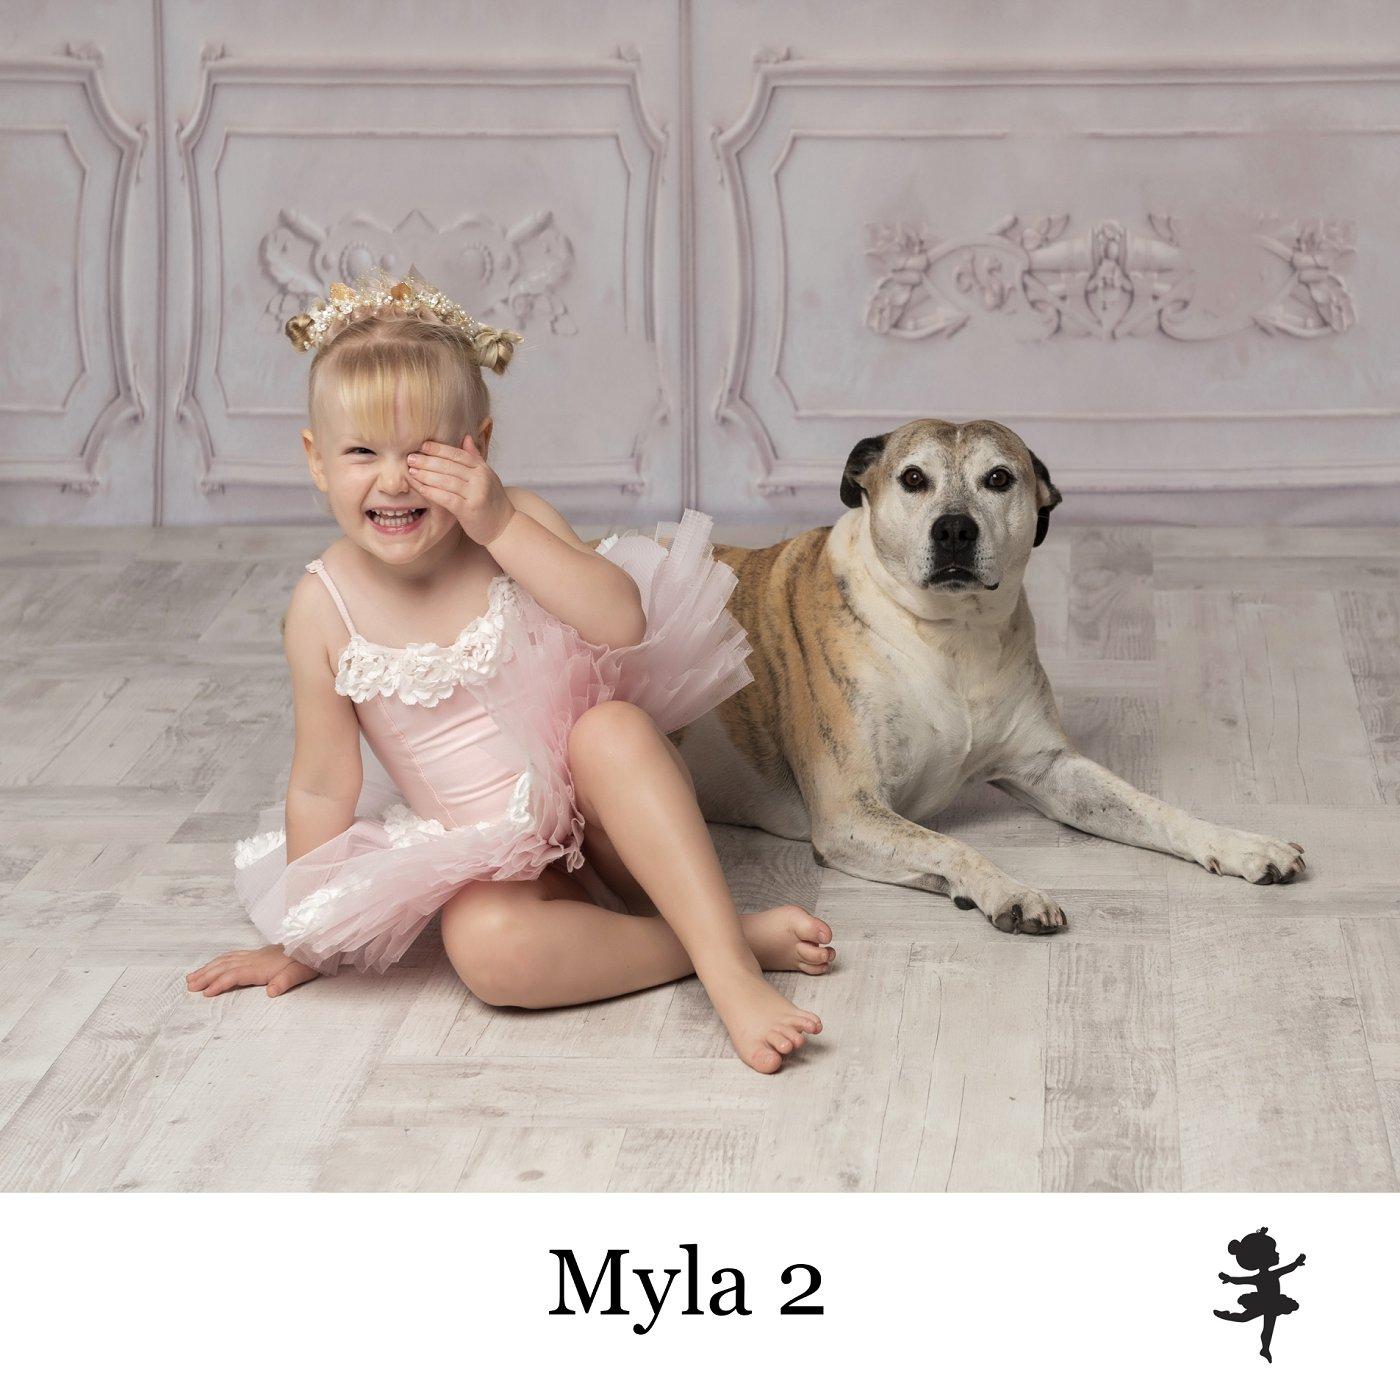 LB8619-Myla2.jpg